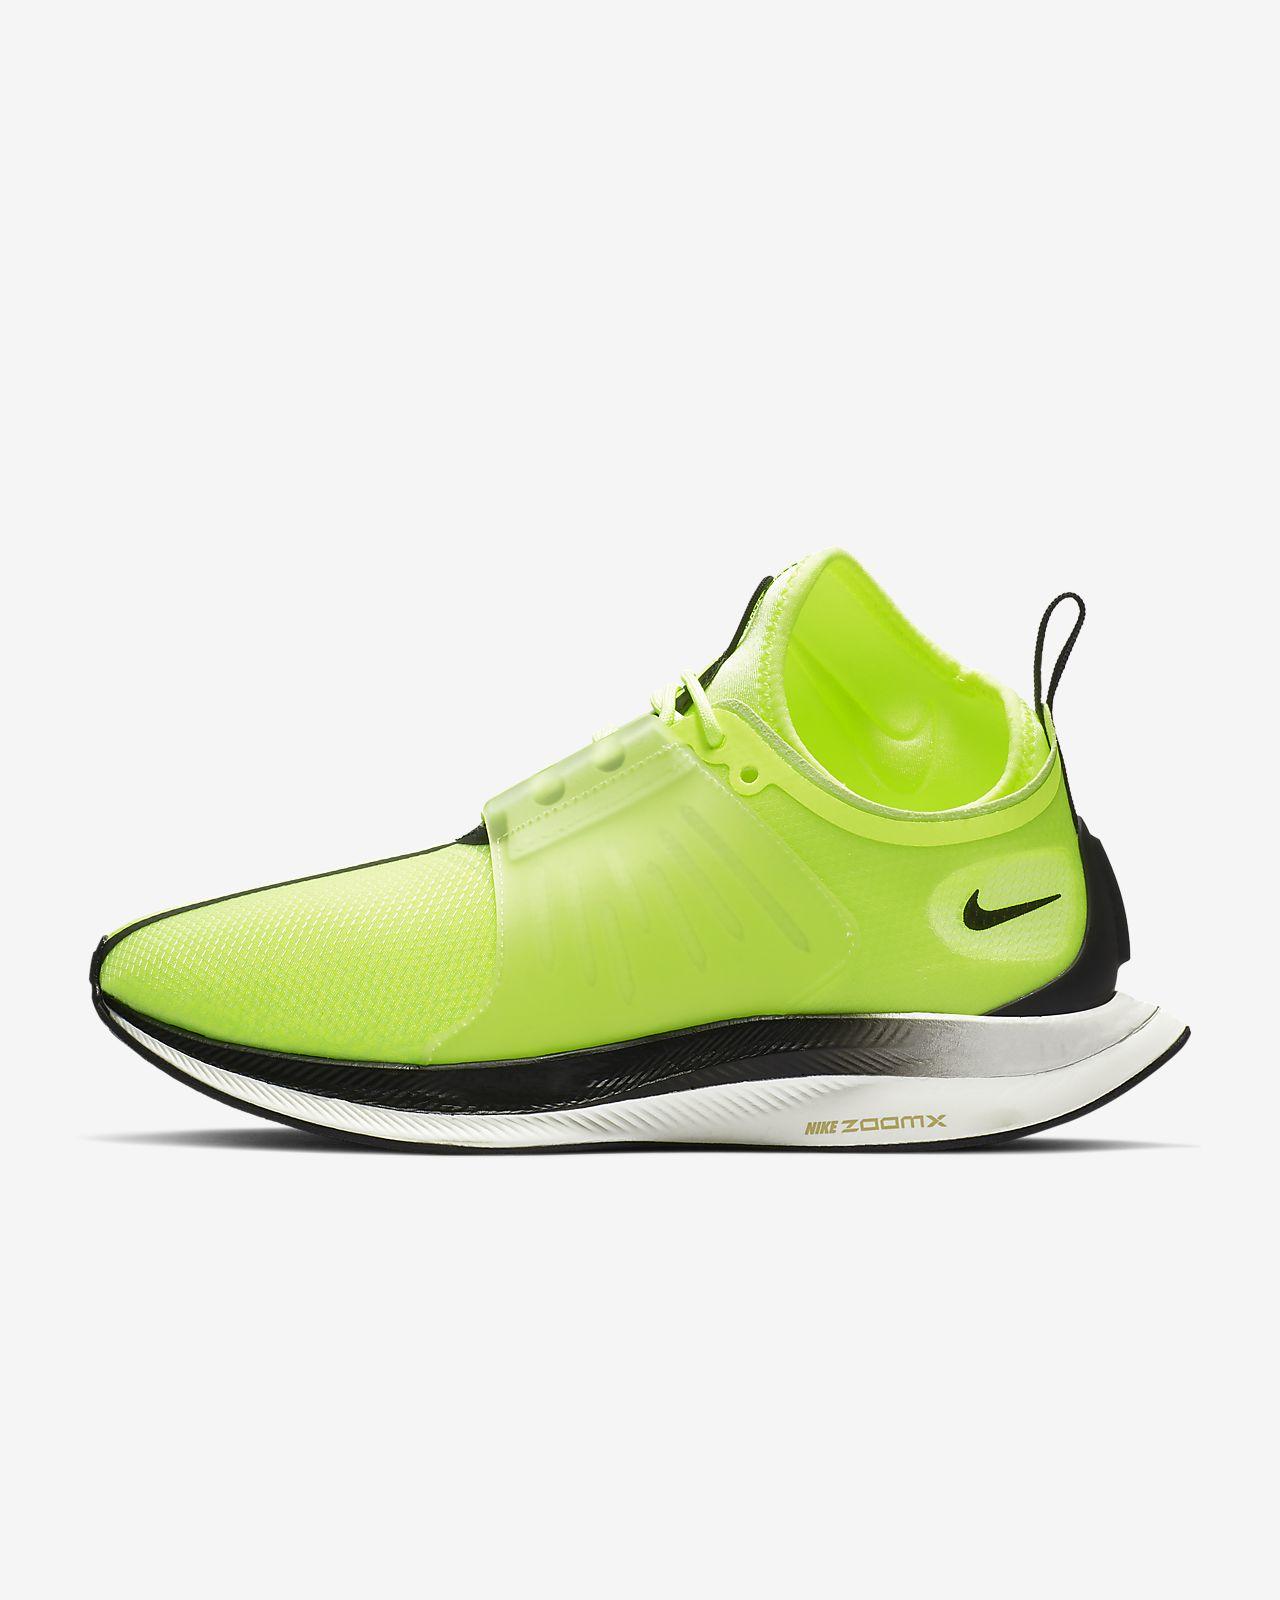 premium selection 59844 9926c Nike Zoom Pegasus Turbo XX Damen-Laufschuh